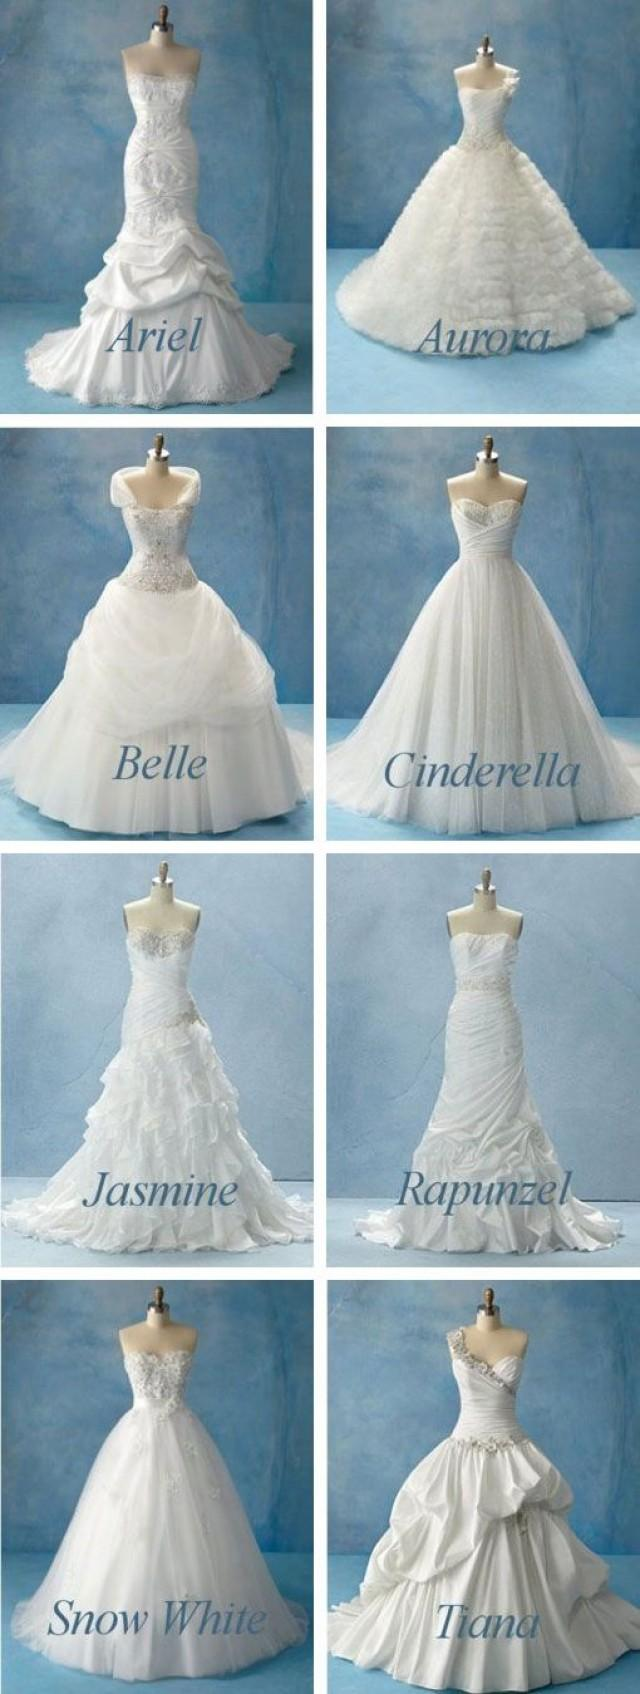 Disney Princess Wedding Dresses Tumblr | Dress images